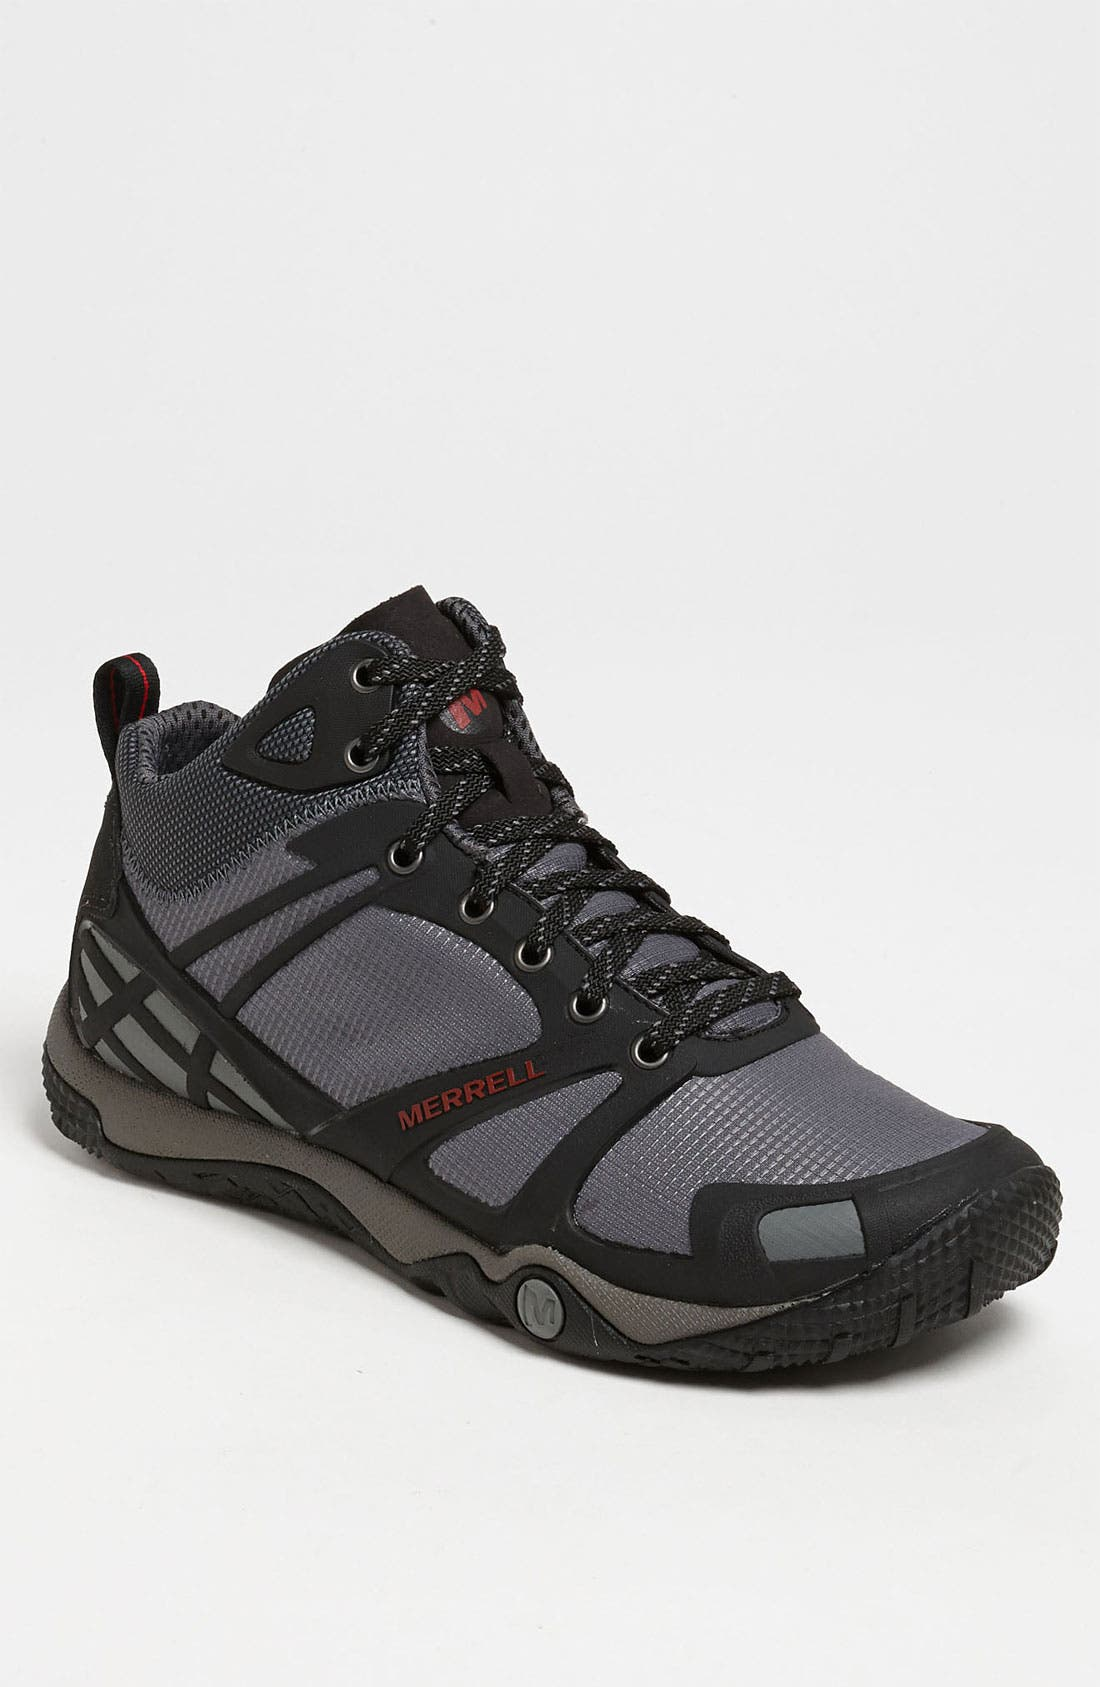 Main Image - Merrell 'Proterra Mid Sport' Hiking Boot (Men)